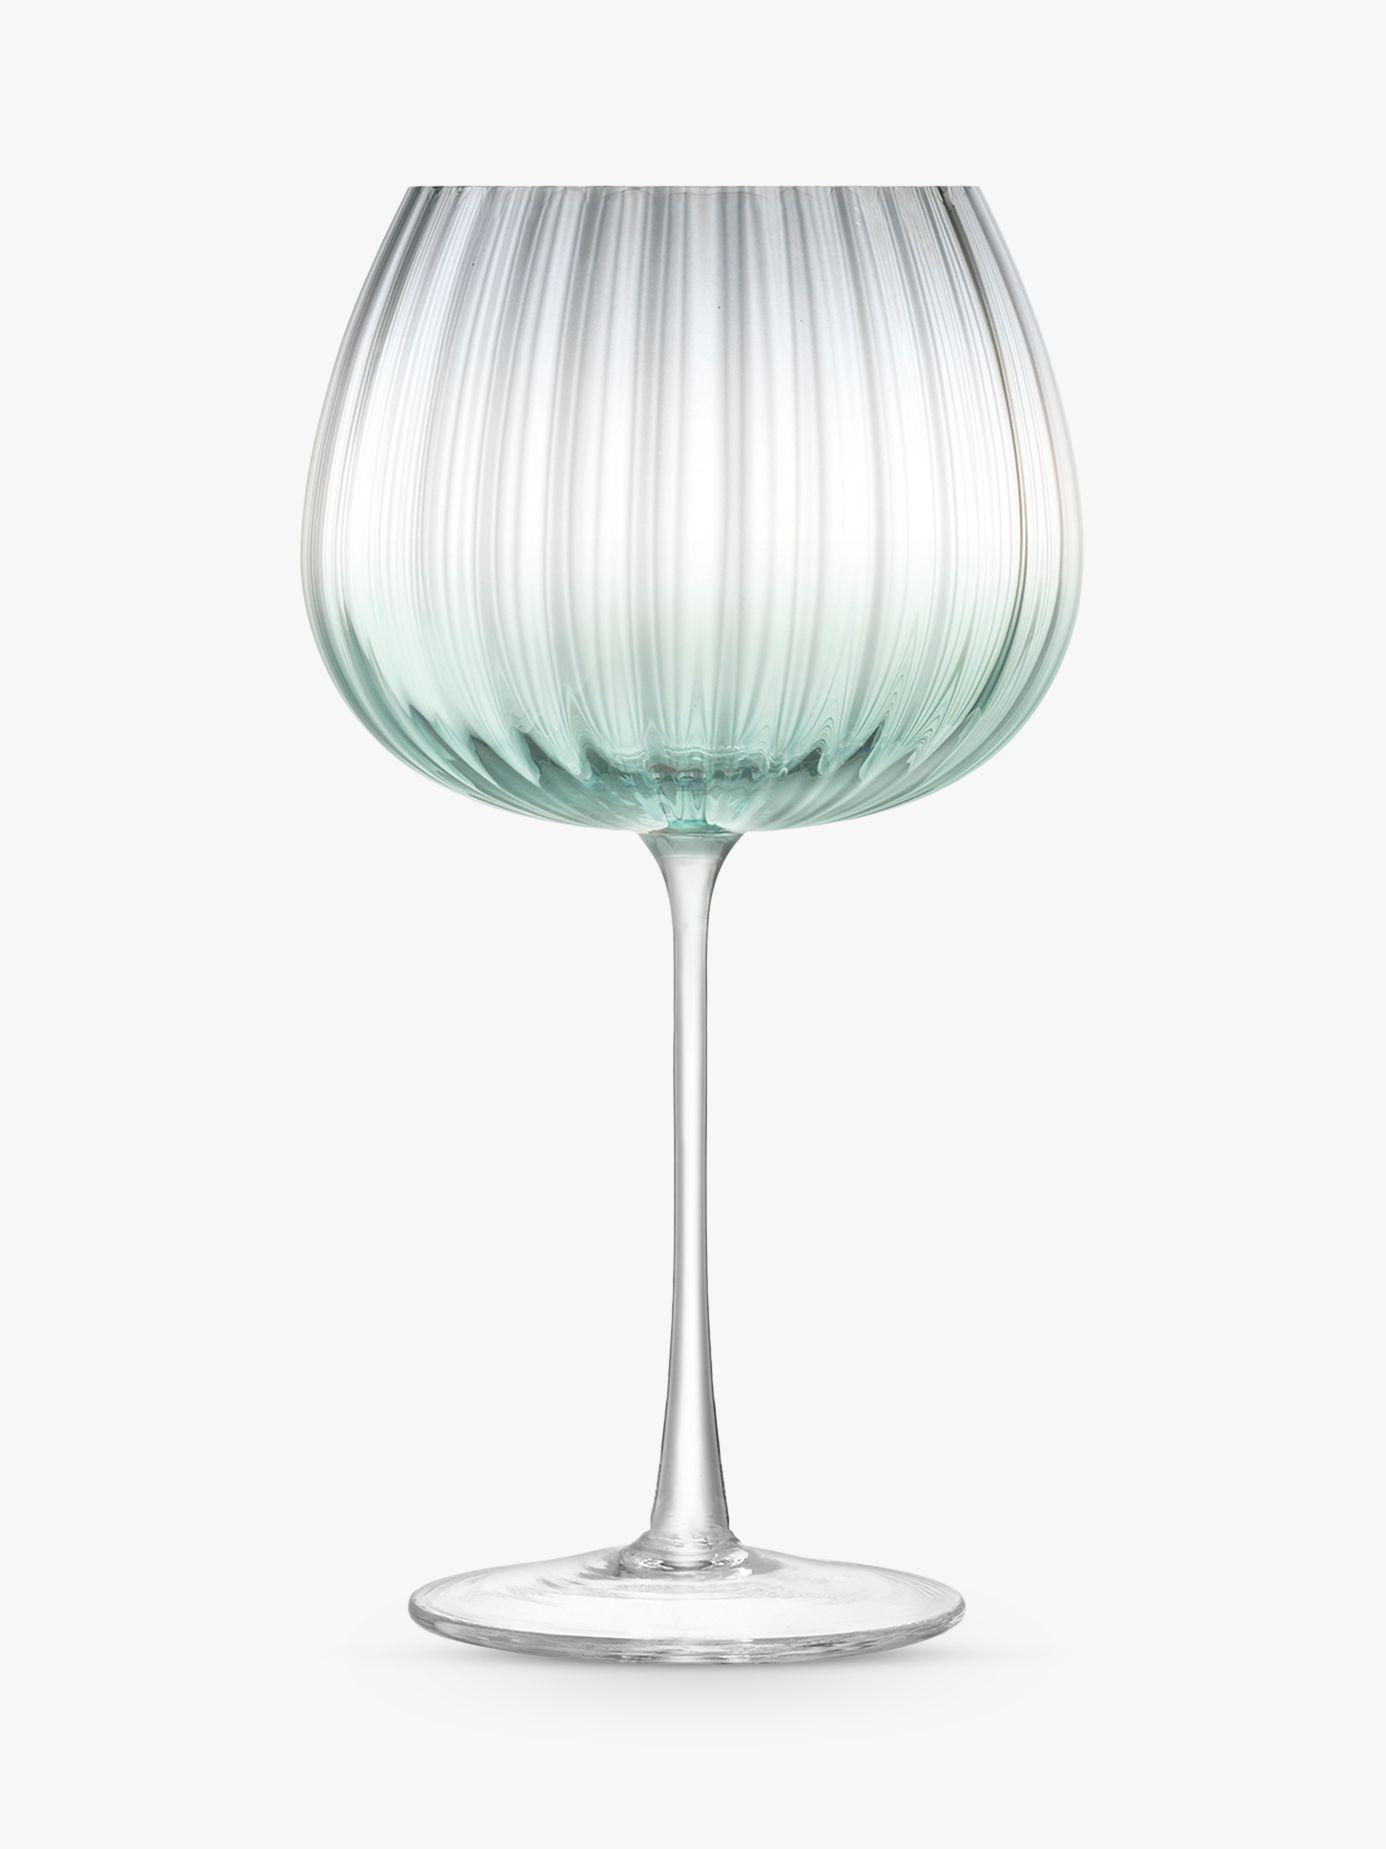 LSA International Dusk Balloon Gin Glass, 650ml, Set of 2